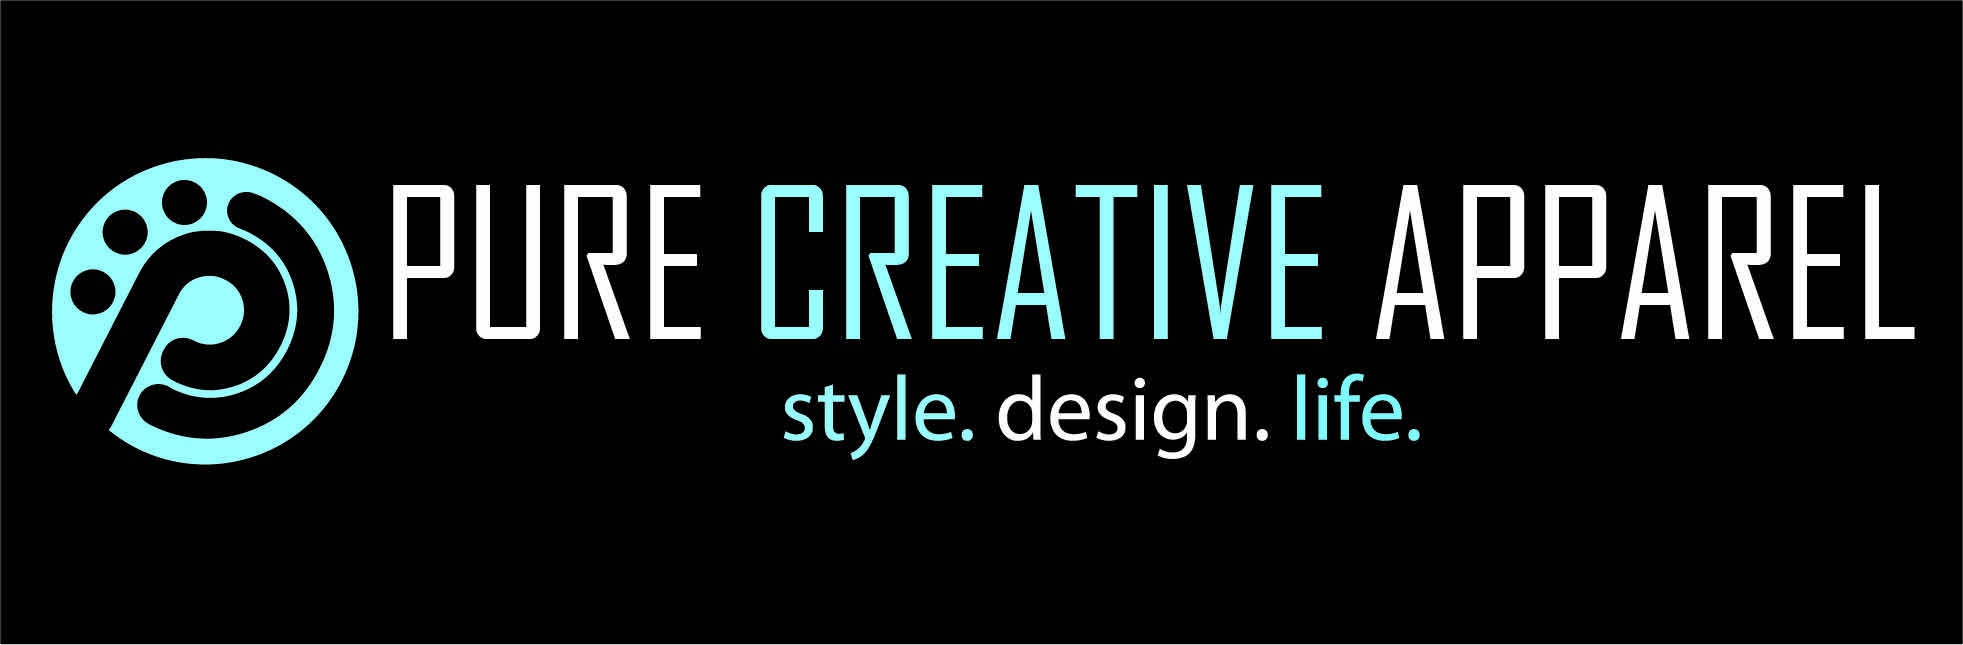 Pure_Creative_Action logo-01 3.jpg